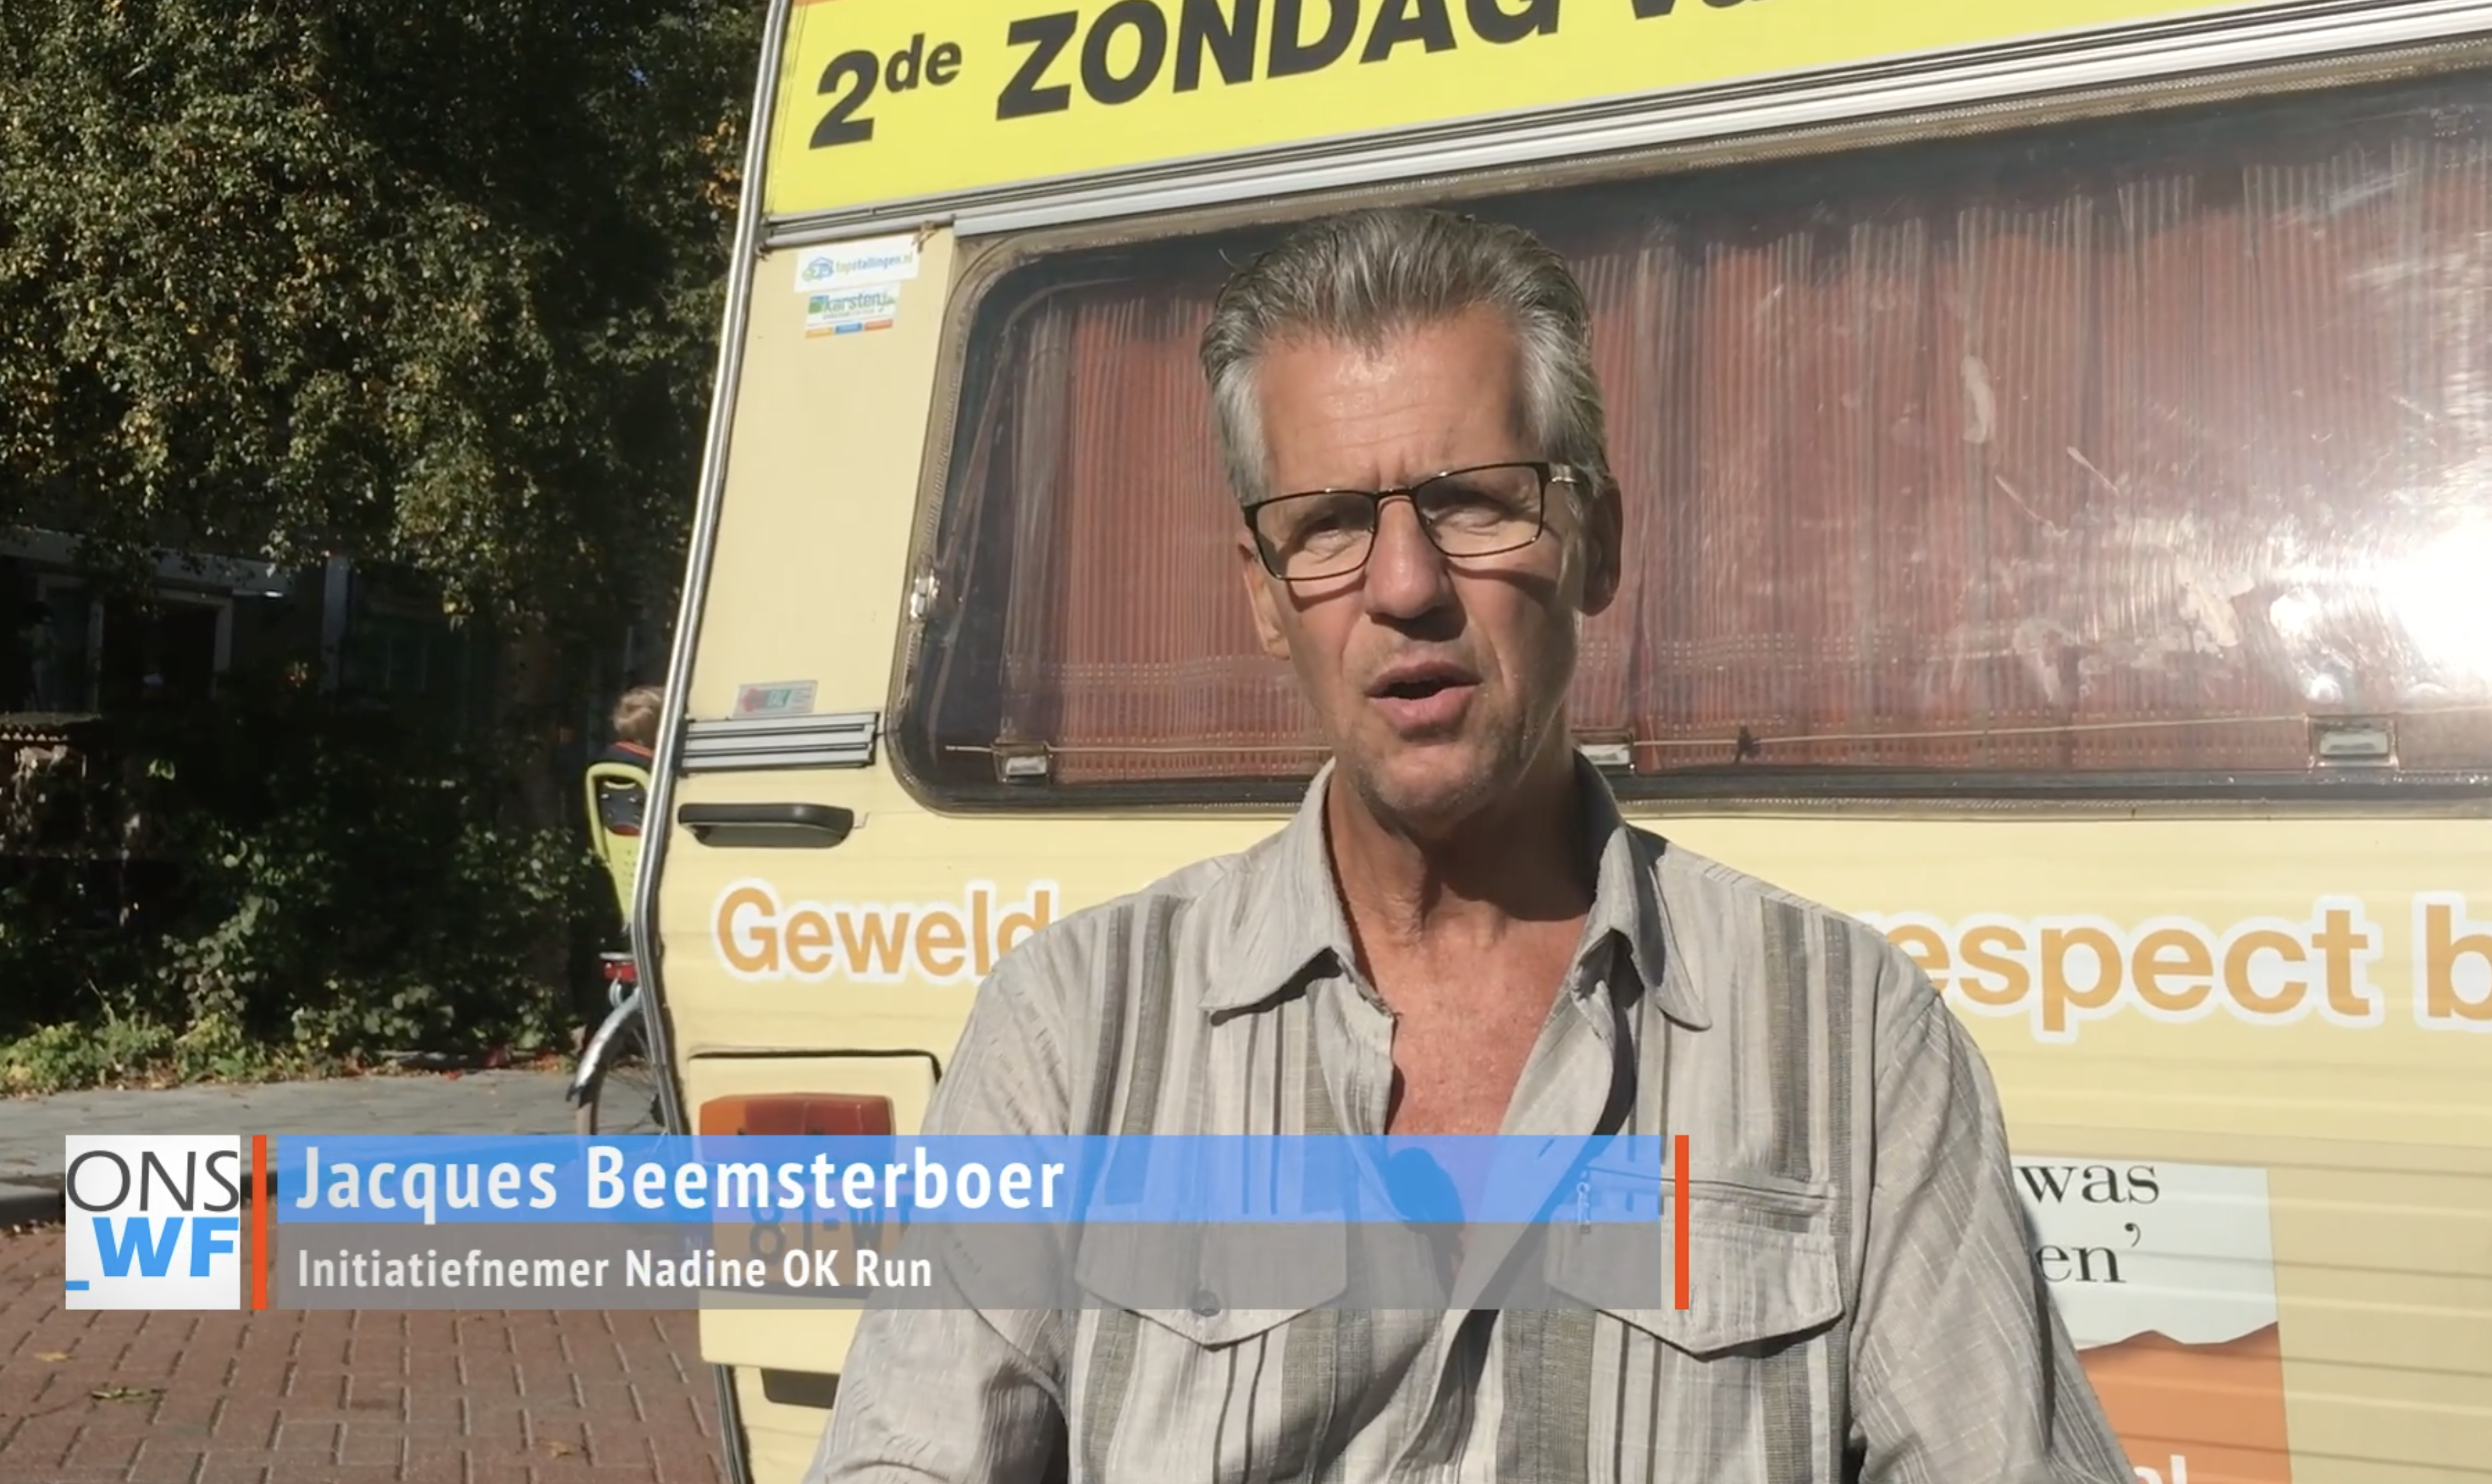 Jacques Beemsterboer; 'Mooi afscheid van Hoorn' [video interview]